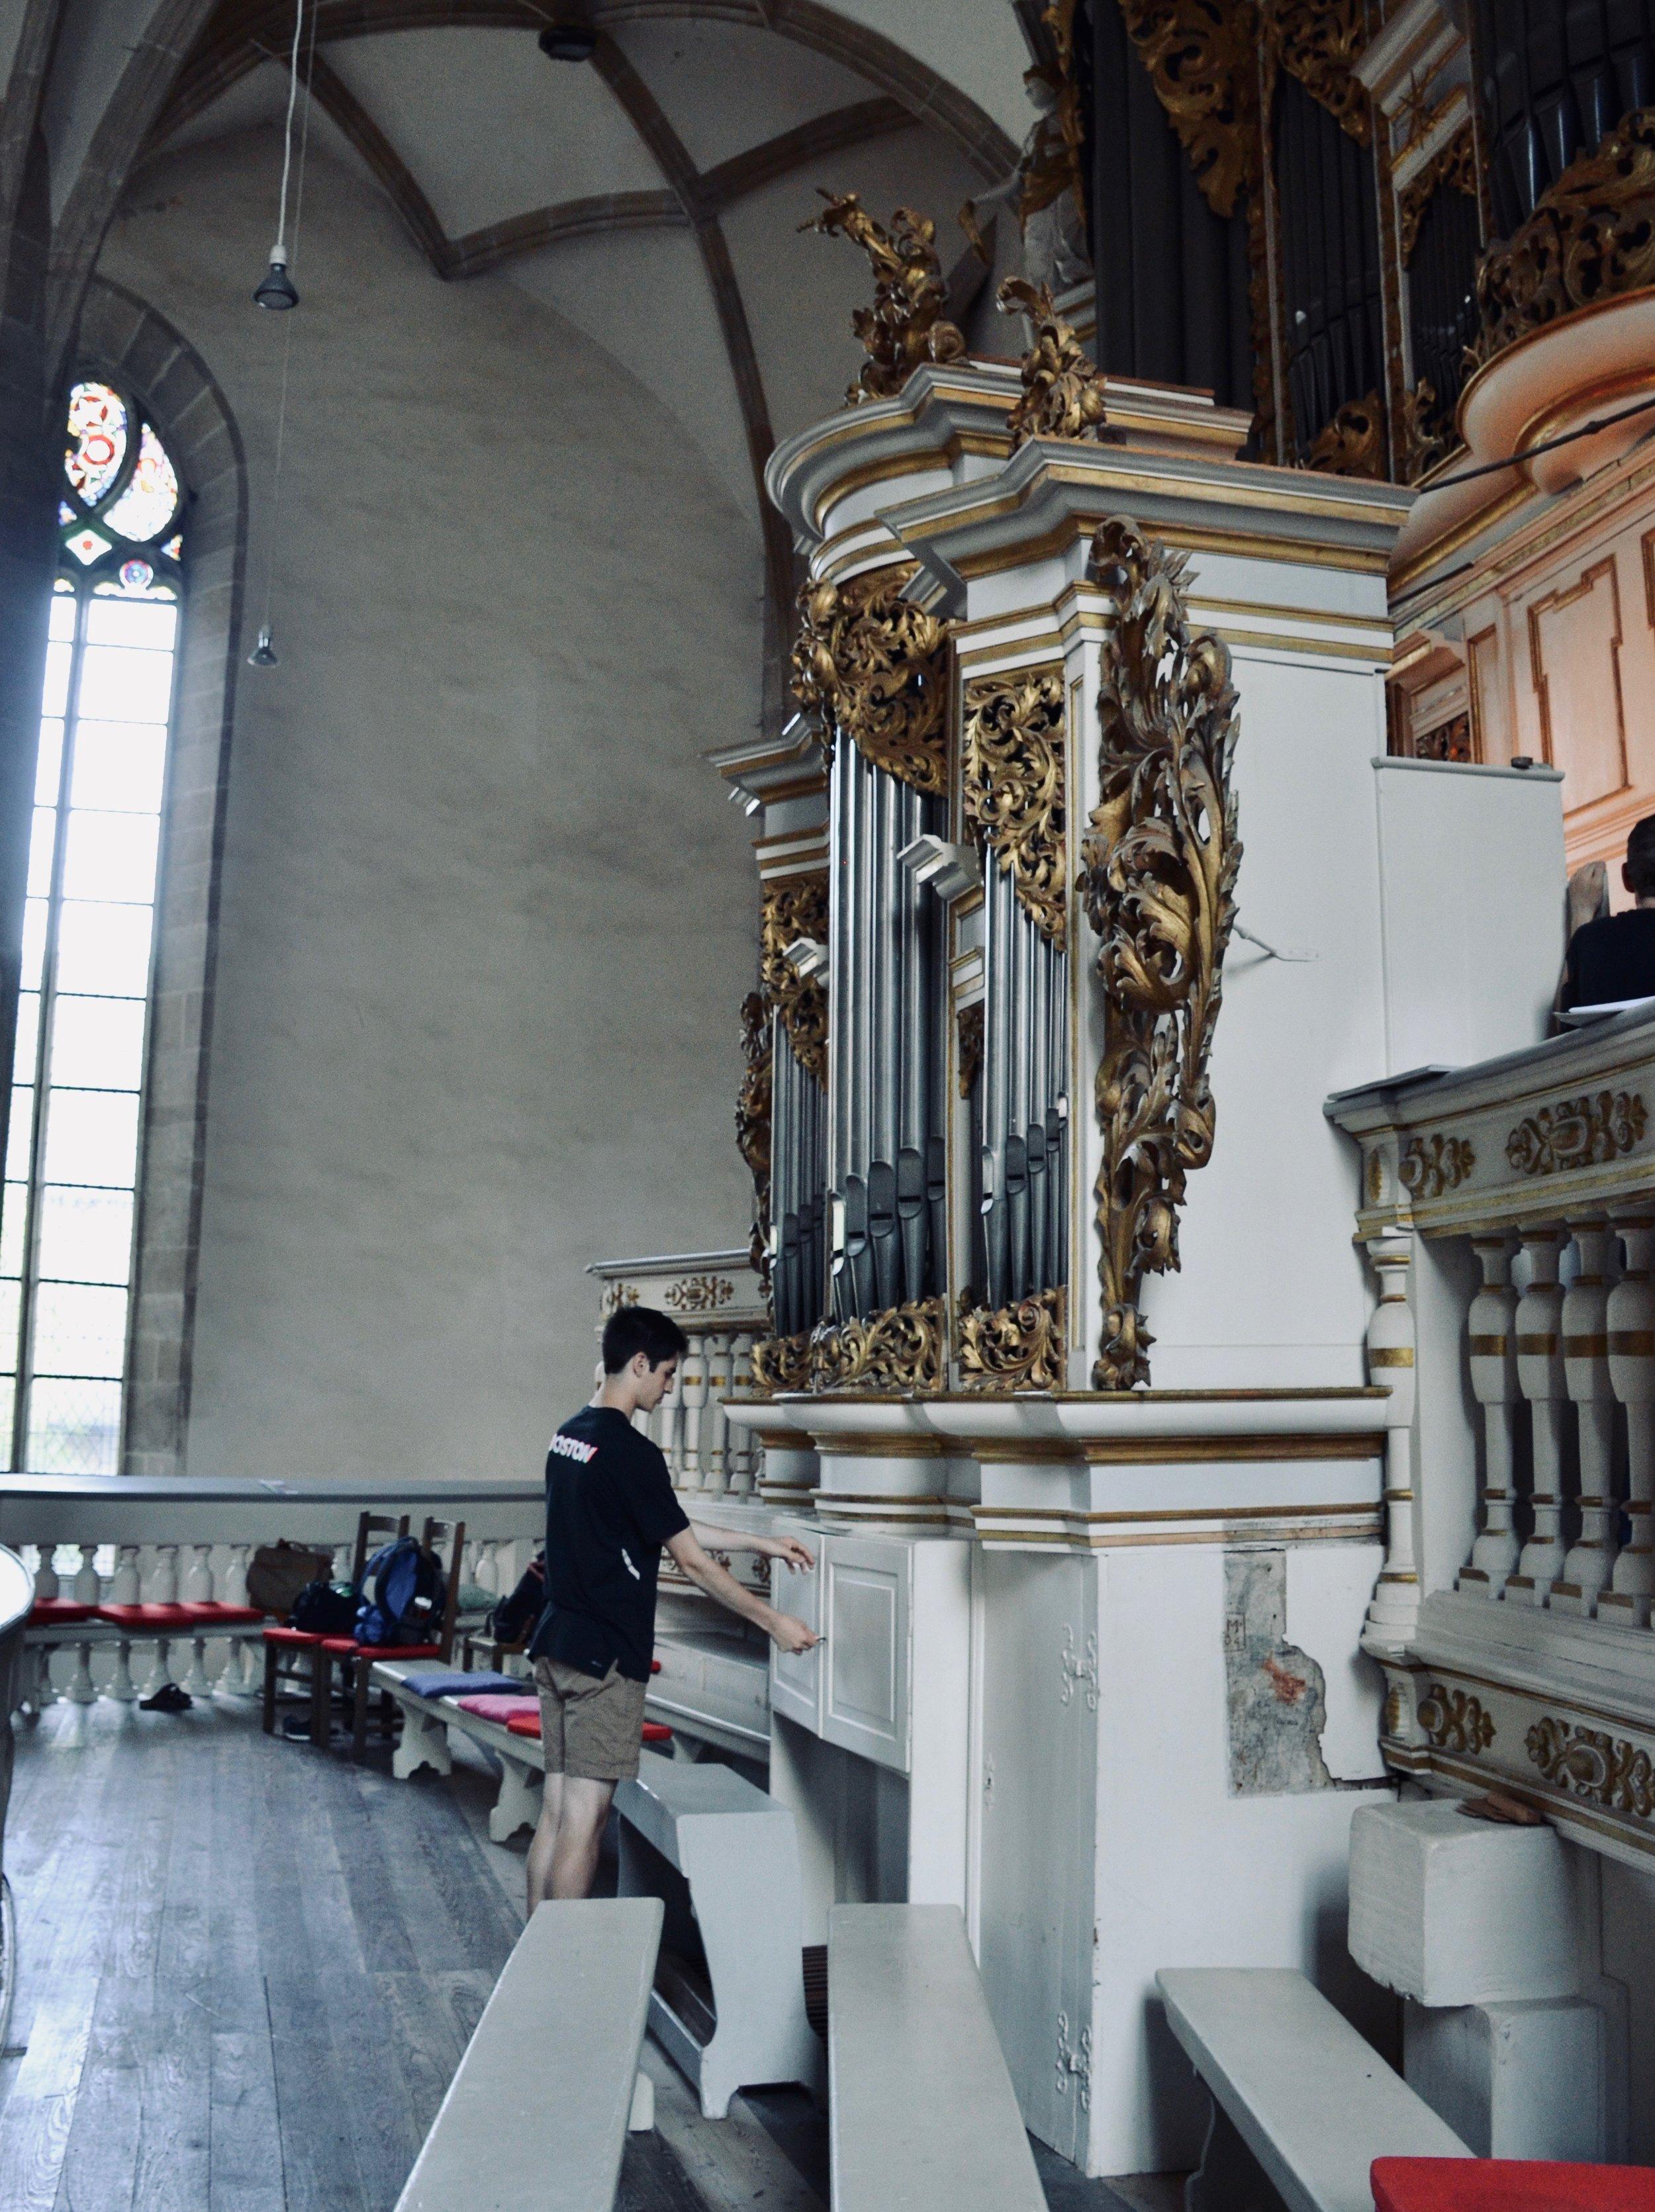 Alex Marin opens the cabinet to the Postiv organ console, 1855 Ladegast Organ, Merseburg Dom.